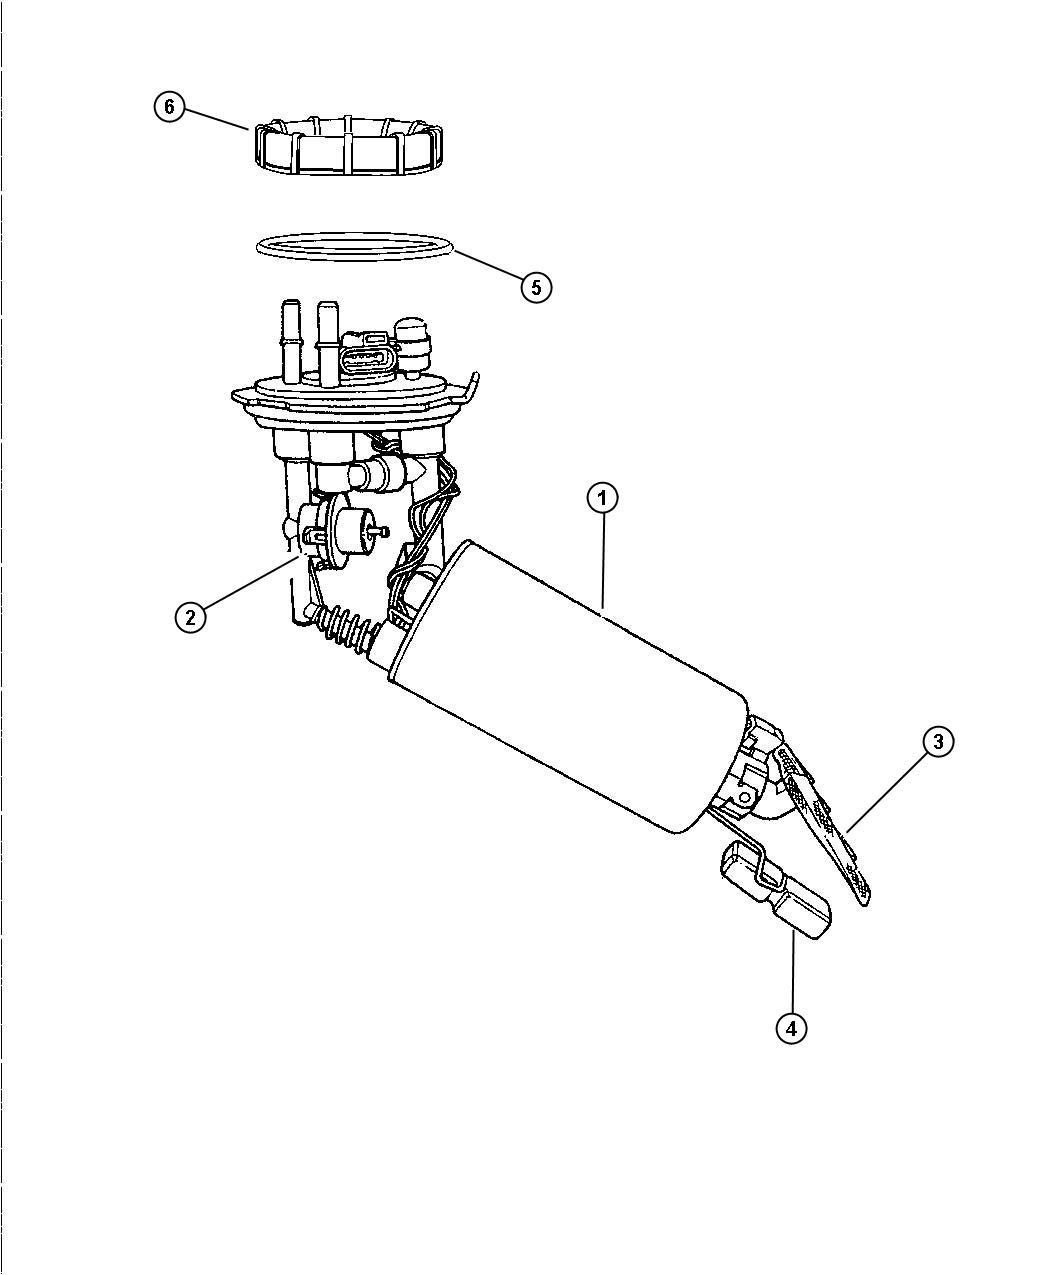 1998 Dodge Stratus Fuel Pump and Level Unit